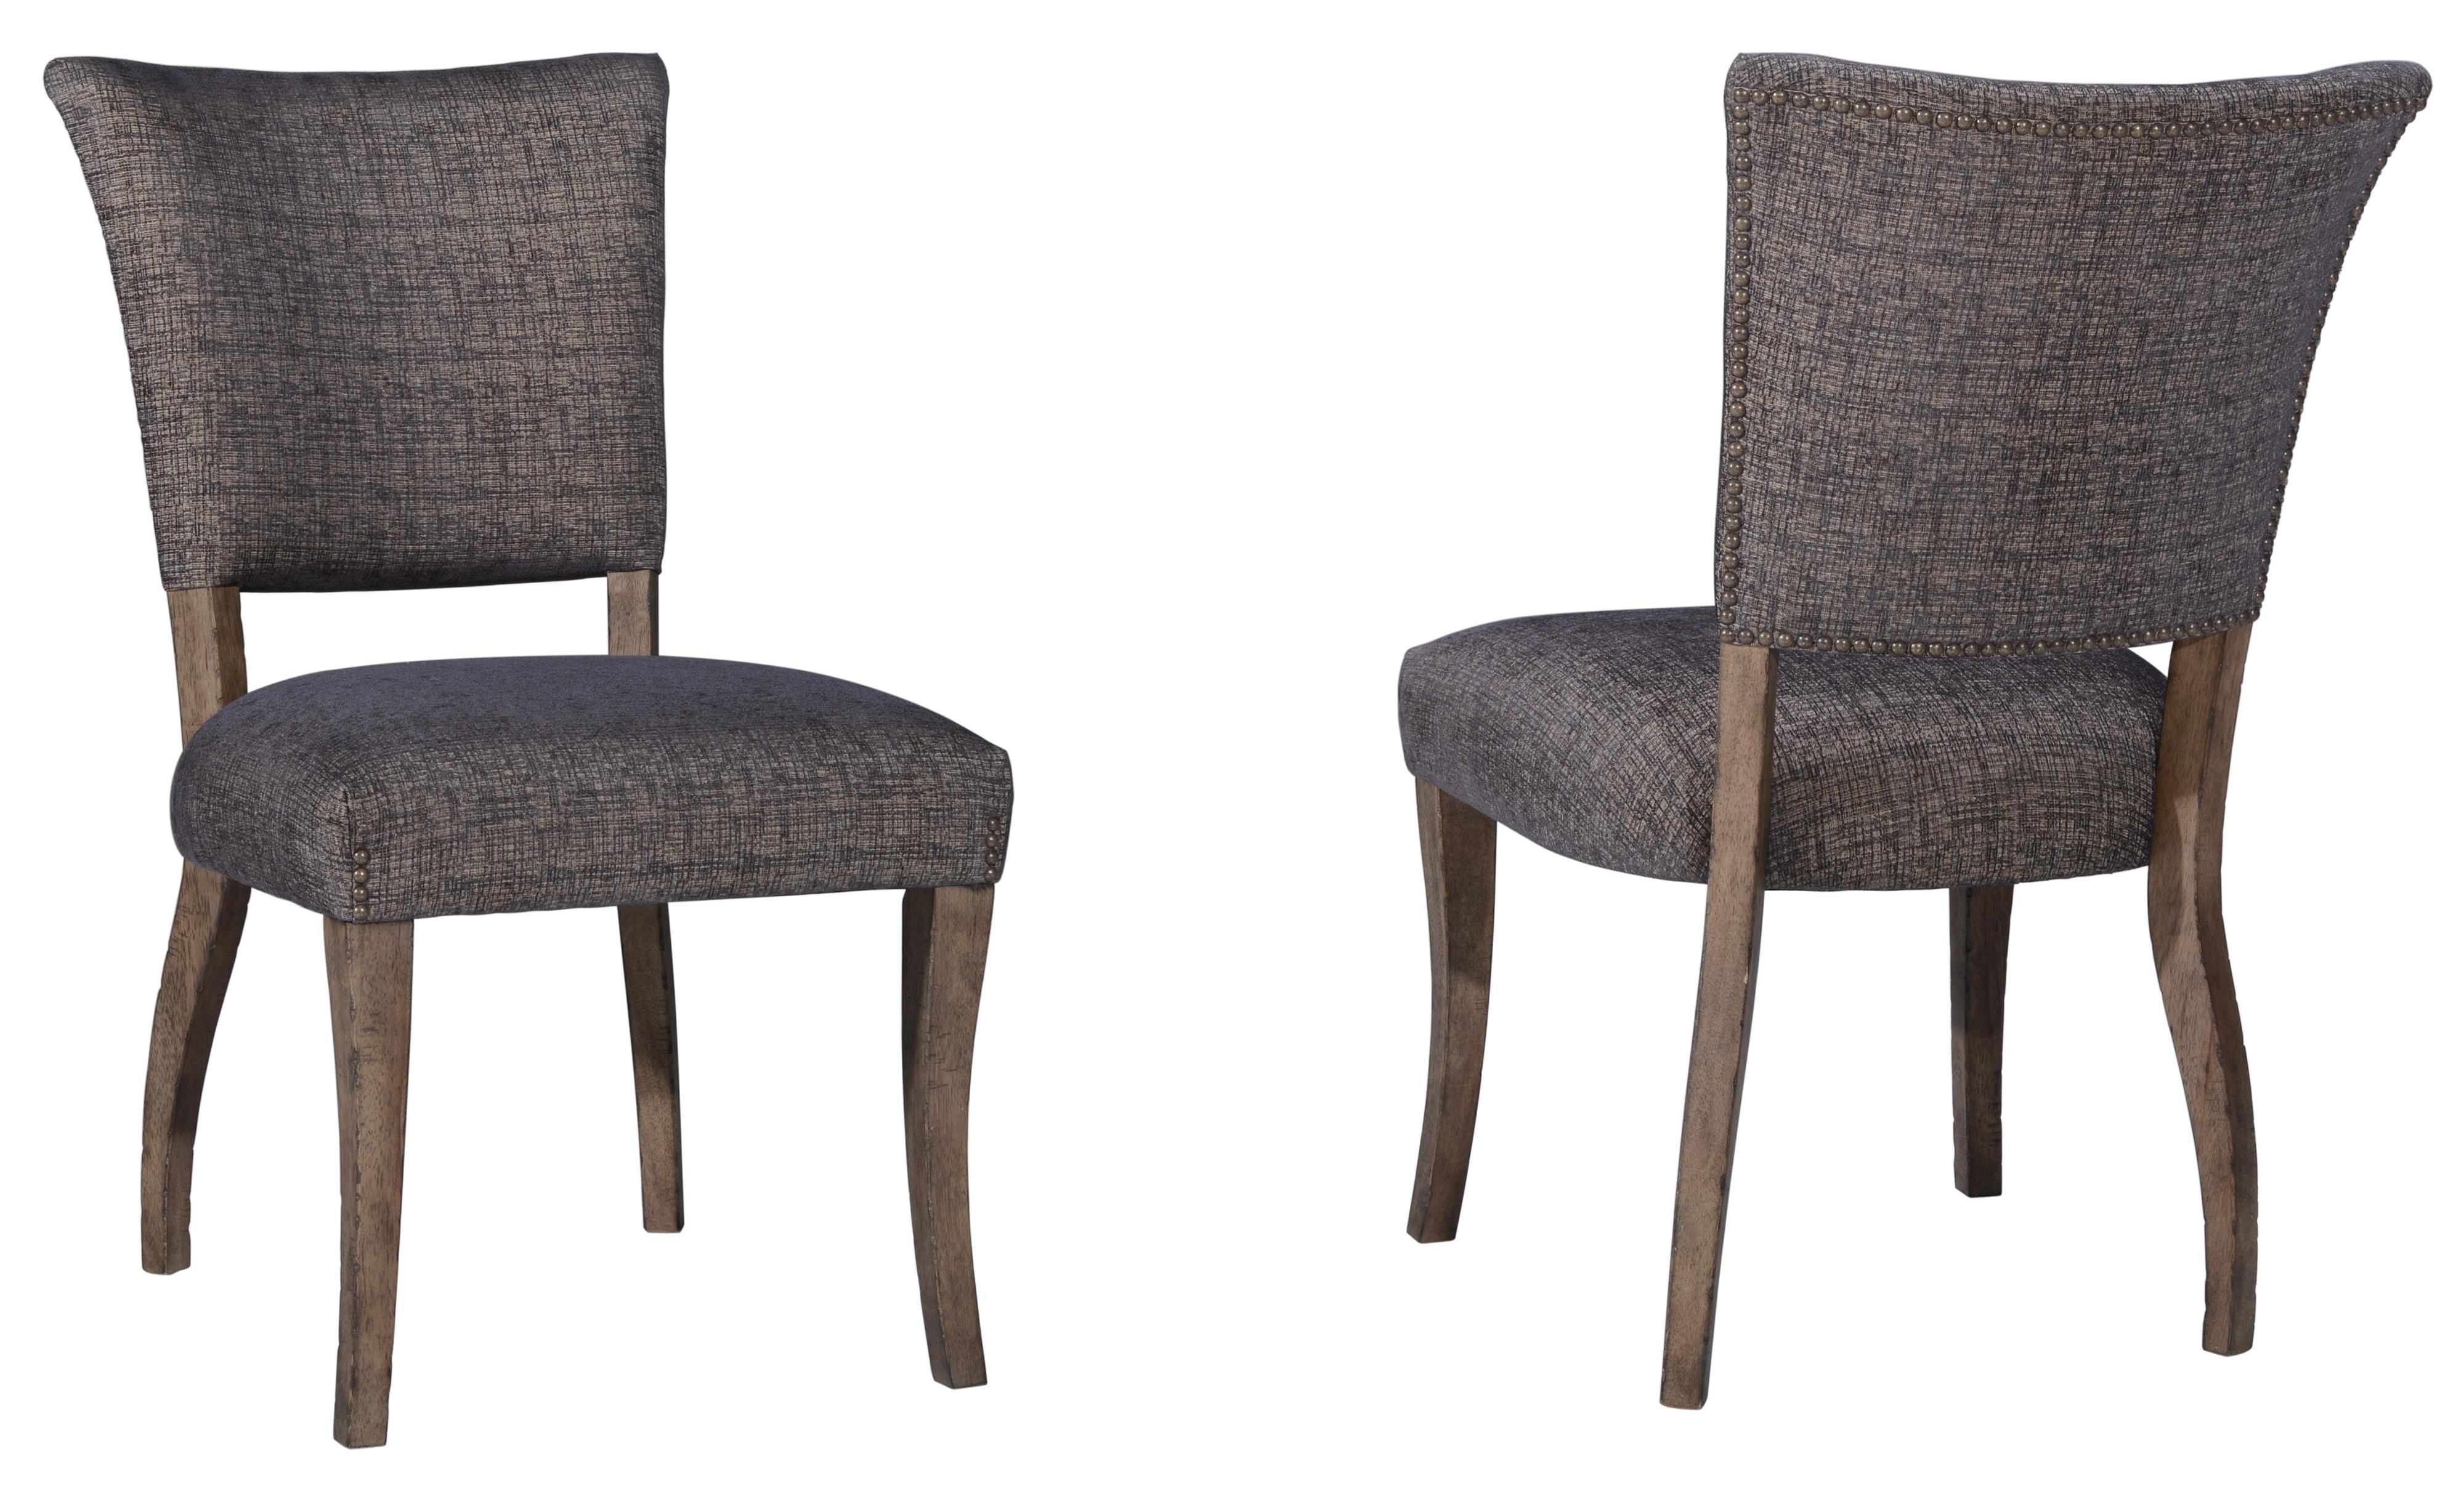 ART Furniture Inc Epicenters 7 Piece Williamsburg  : products2Fartfurnitureinc2Fcolor2Fepicenters223220 23022B6x223202 b6 from www.hudsonsfurniture.com size 4000 x 2426 jpeg 813kB